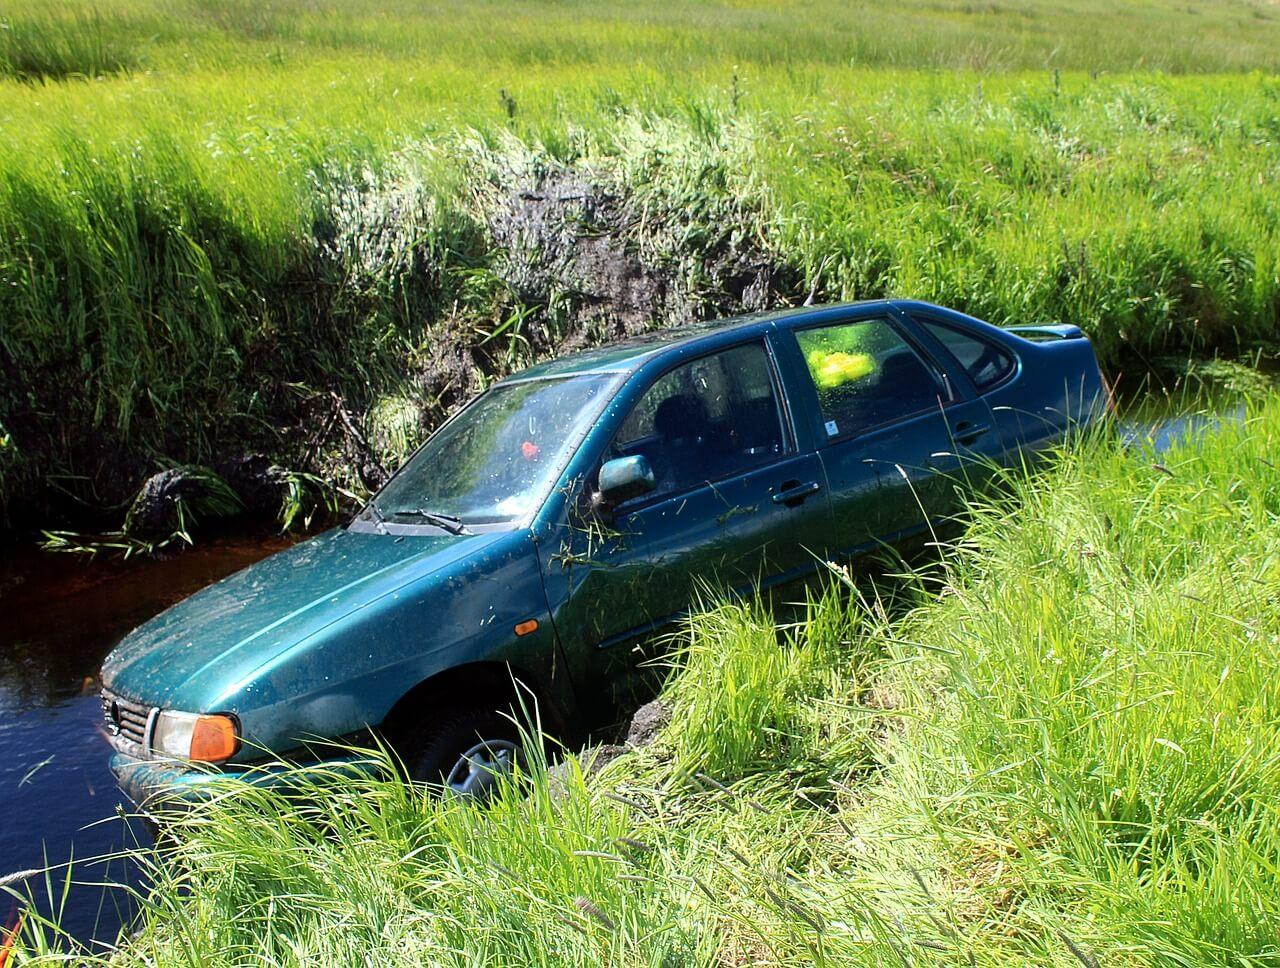 Multi-Vehicle Accidents